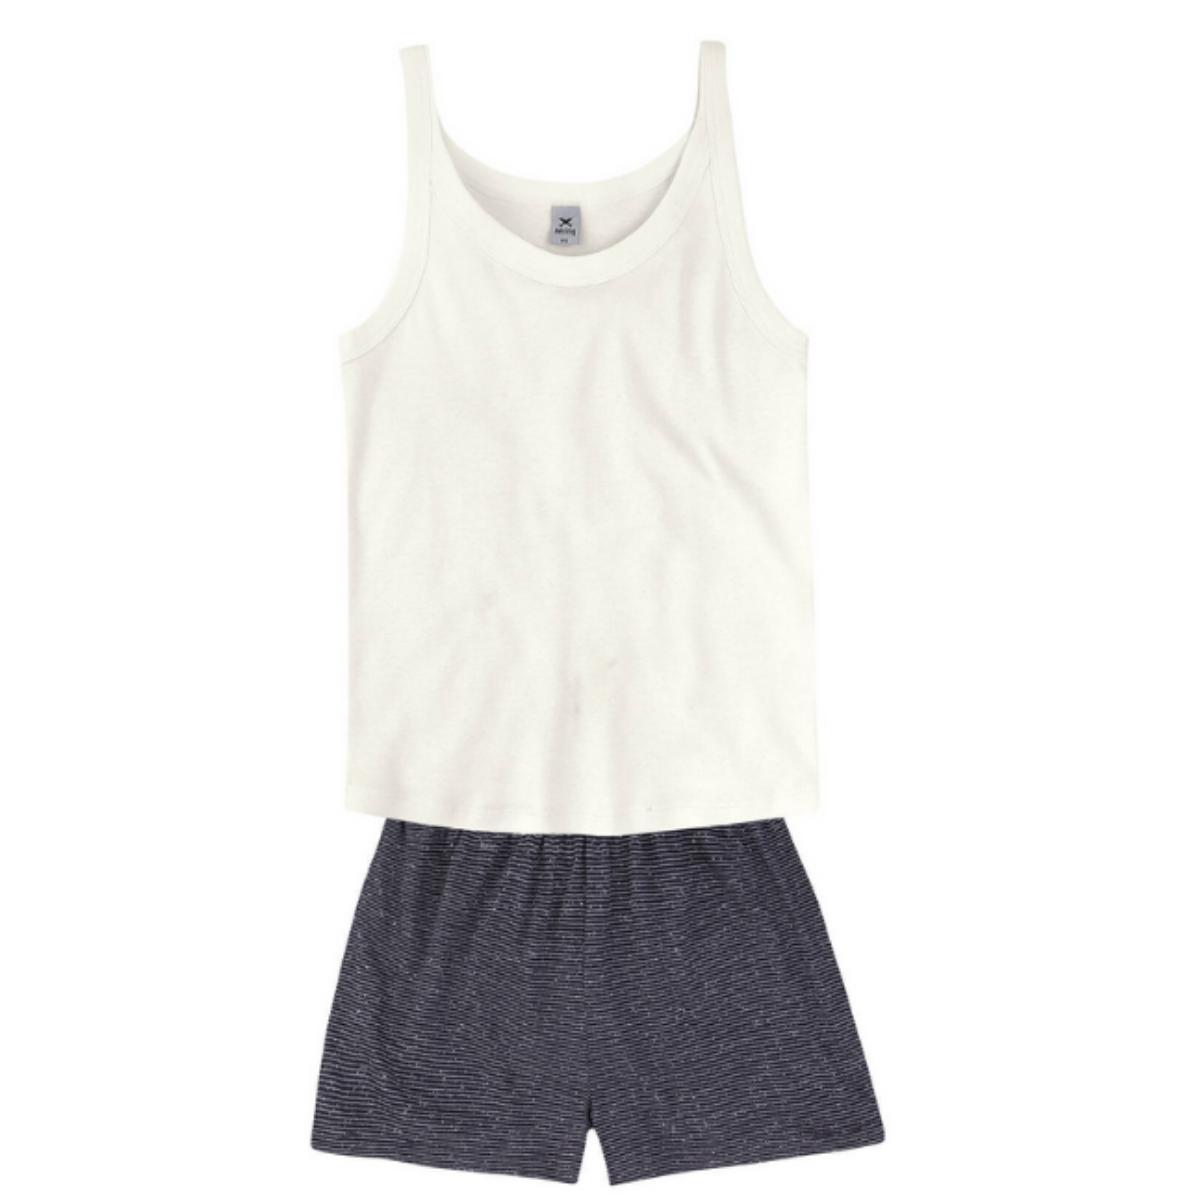 Pijama Feminina Hering 7btz Nmcen Off White/preto